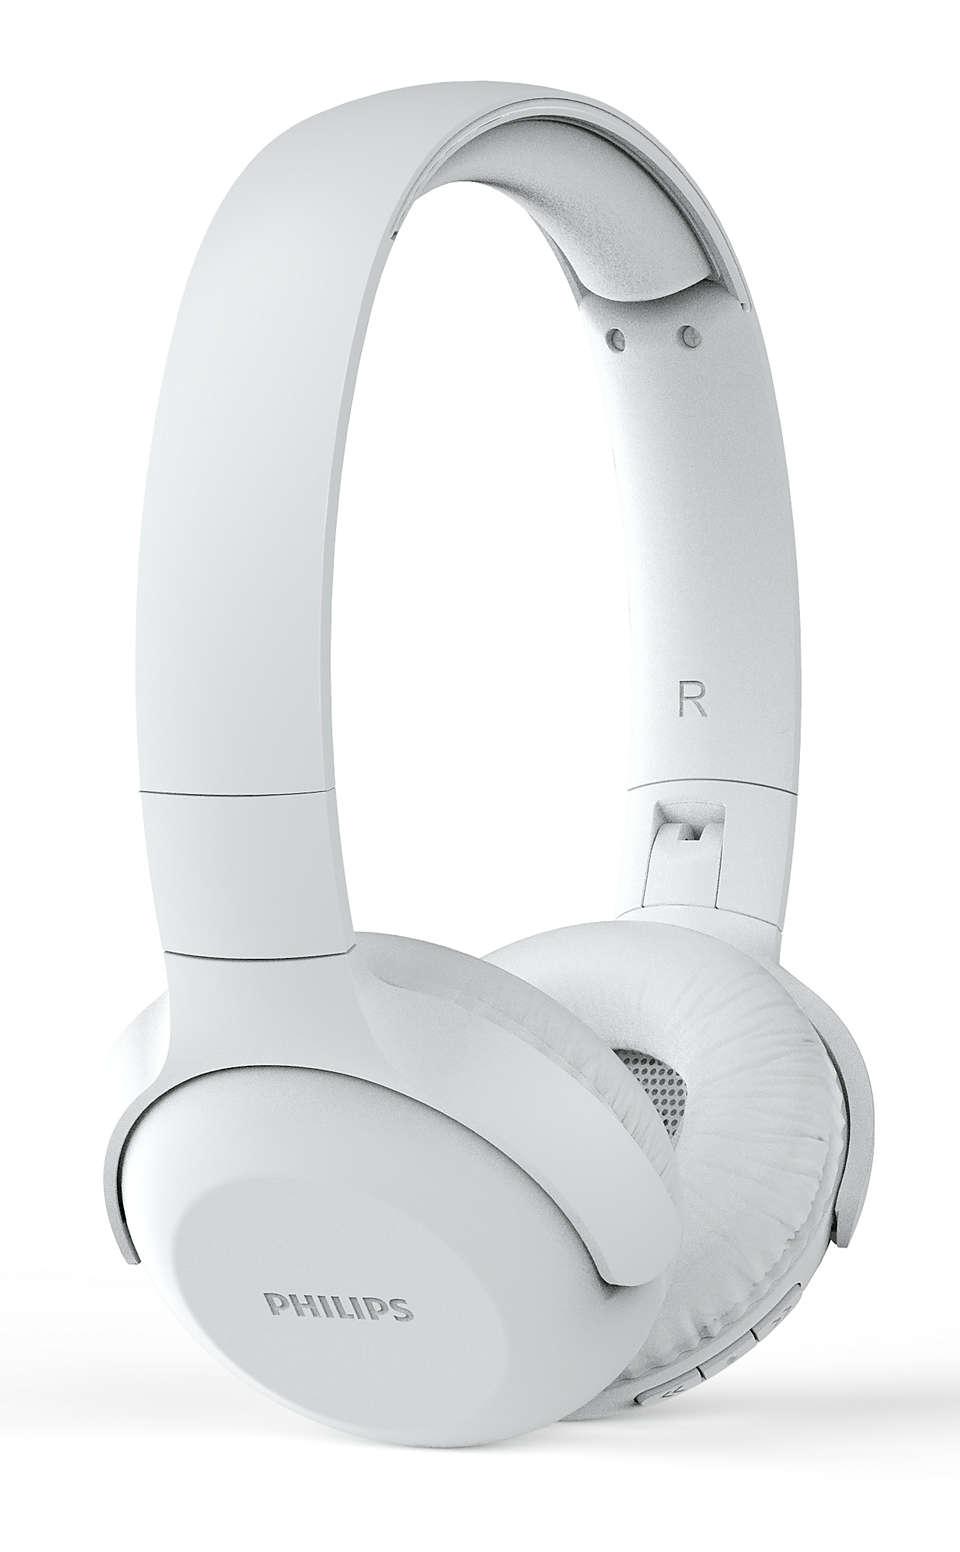 Fone De Ouvido Headphone Philips Wireless Sem Fio Branco - Tauh202wt/00